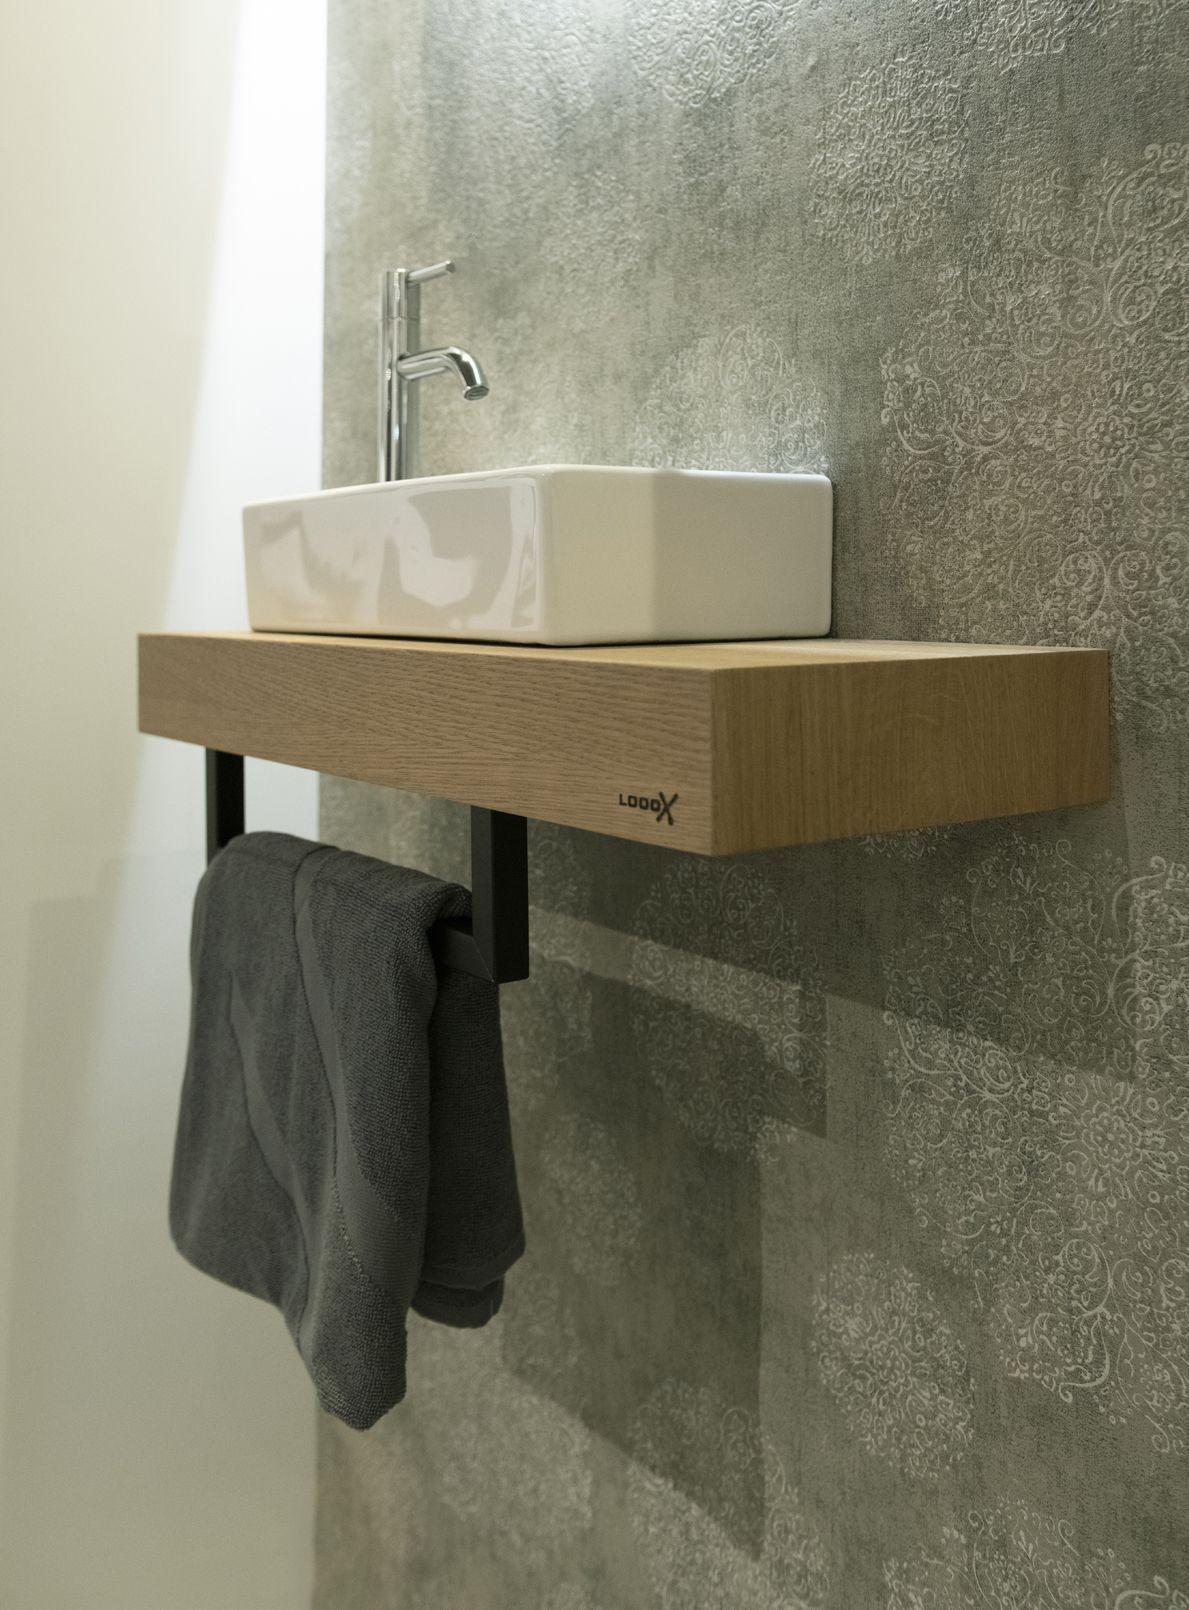 Nice towel holder for bathroom or toilet